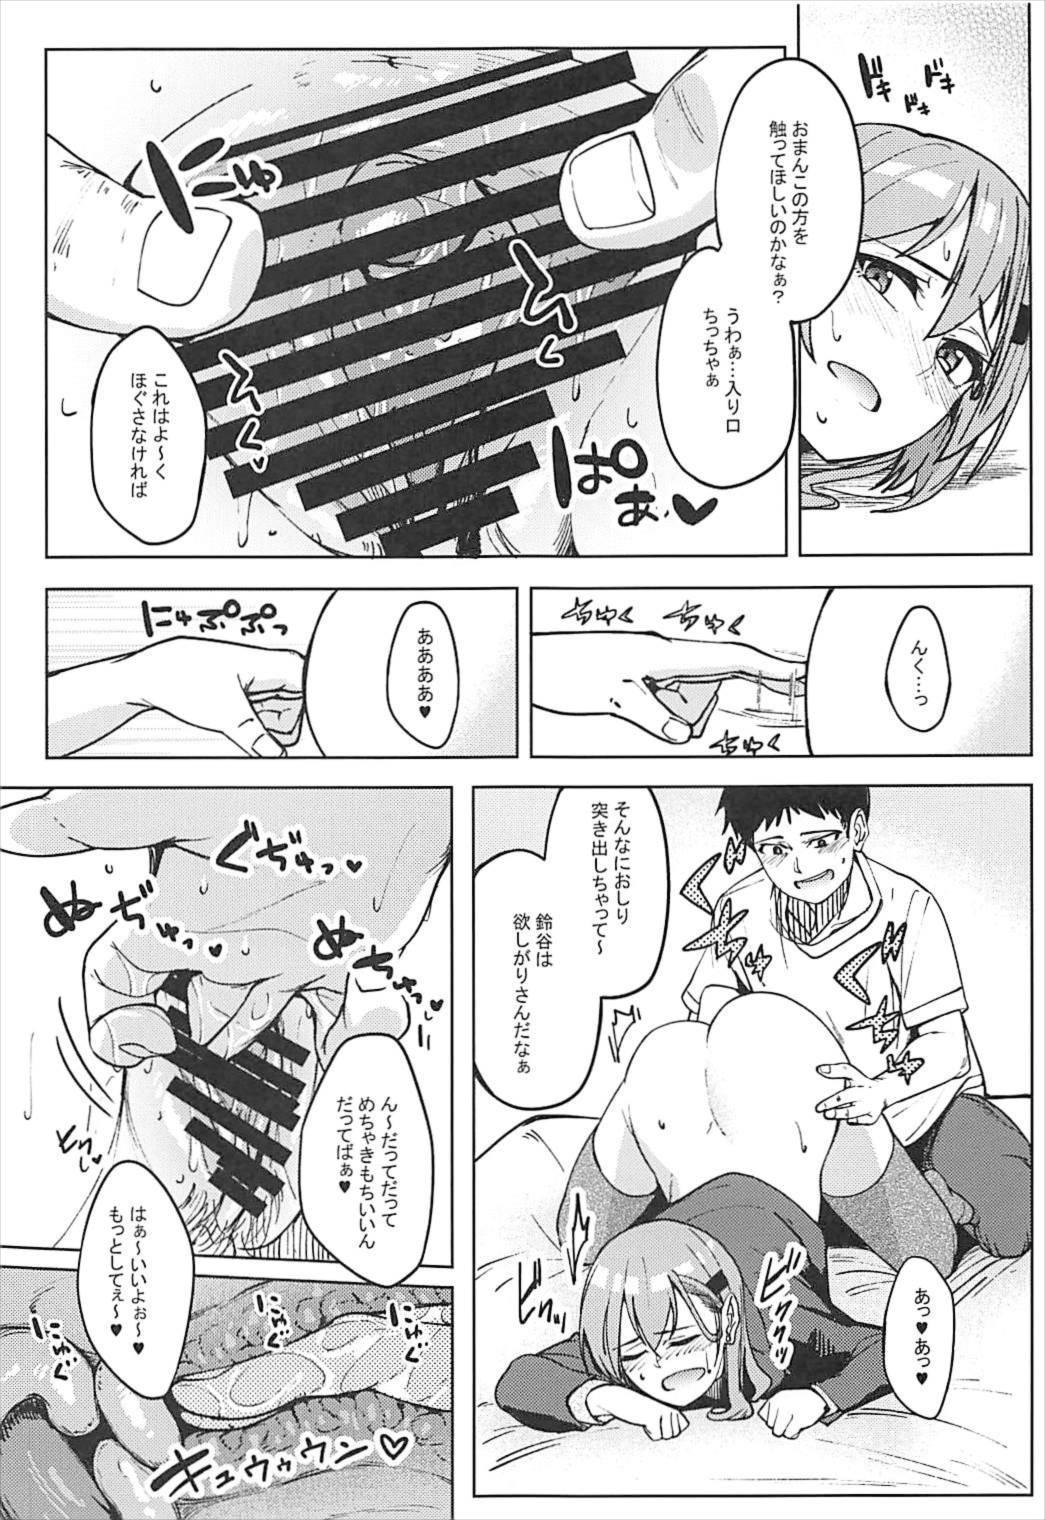 Suzuya to Ecchi Suru? 7